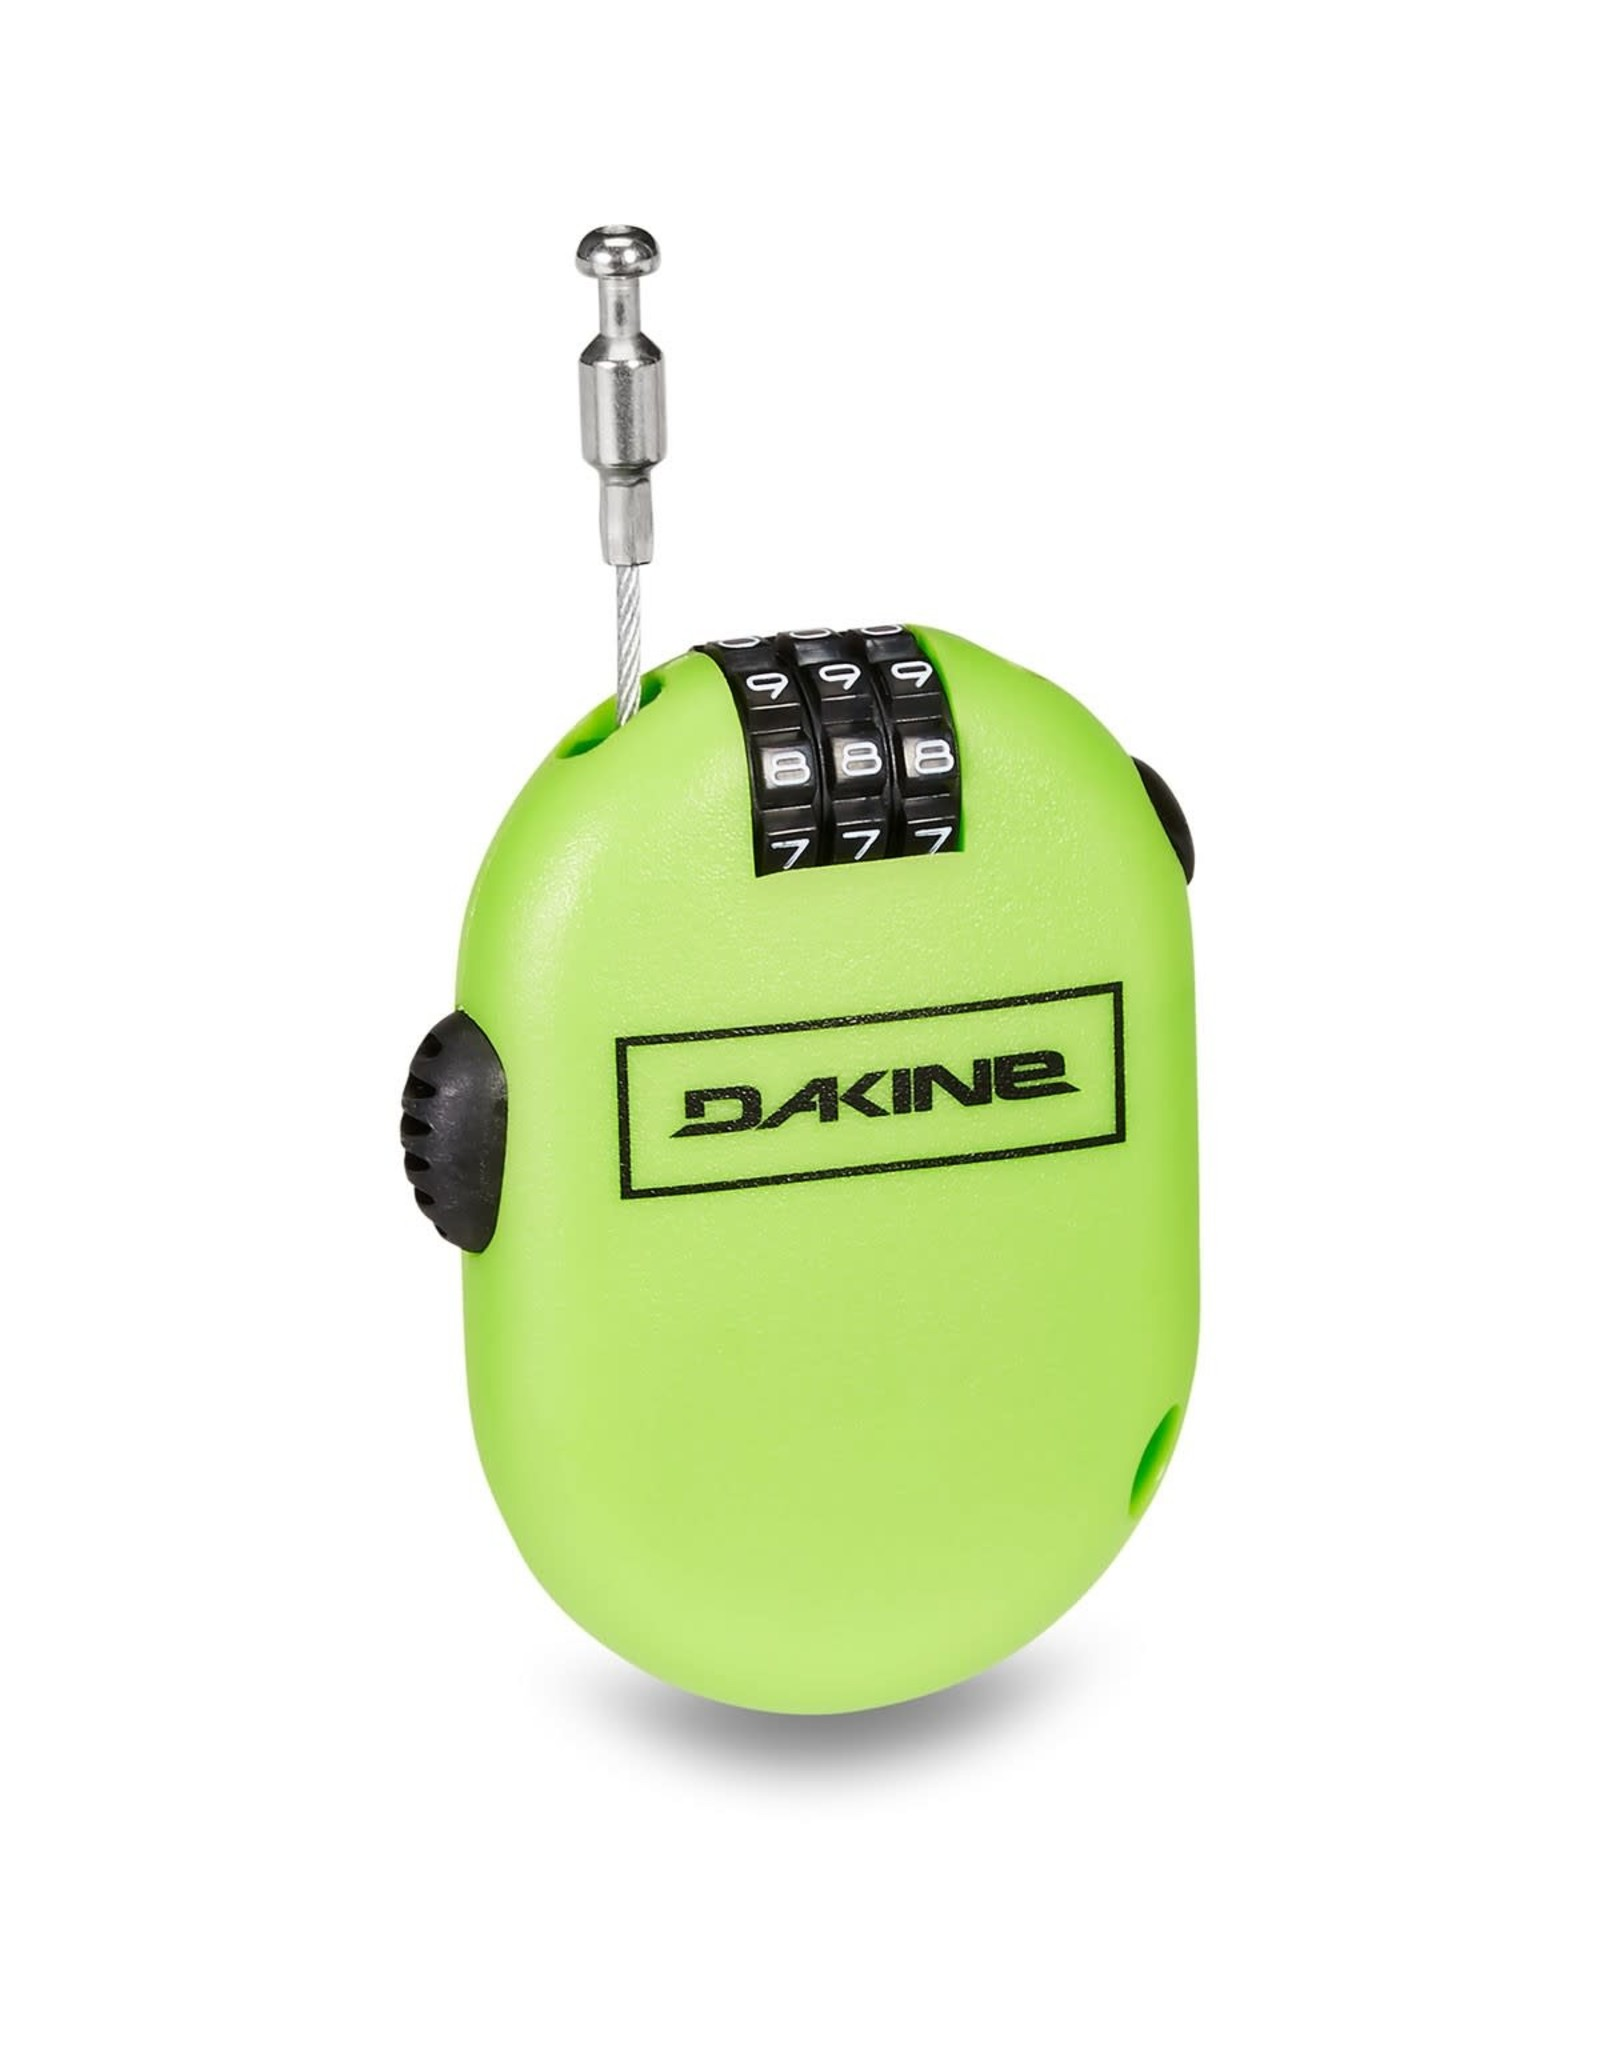 Dakine Dakine Micro Lock Cable Lock